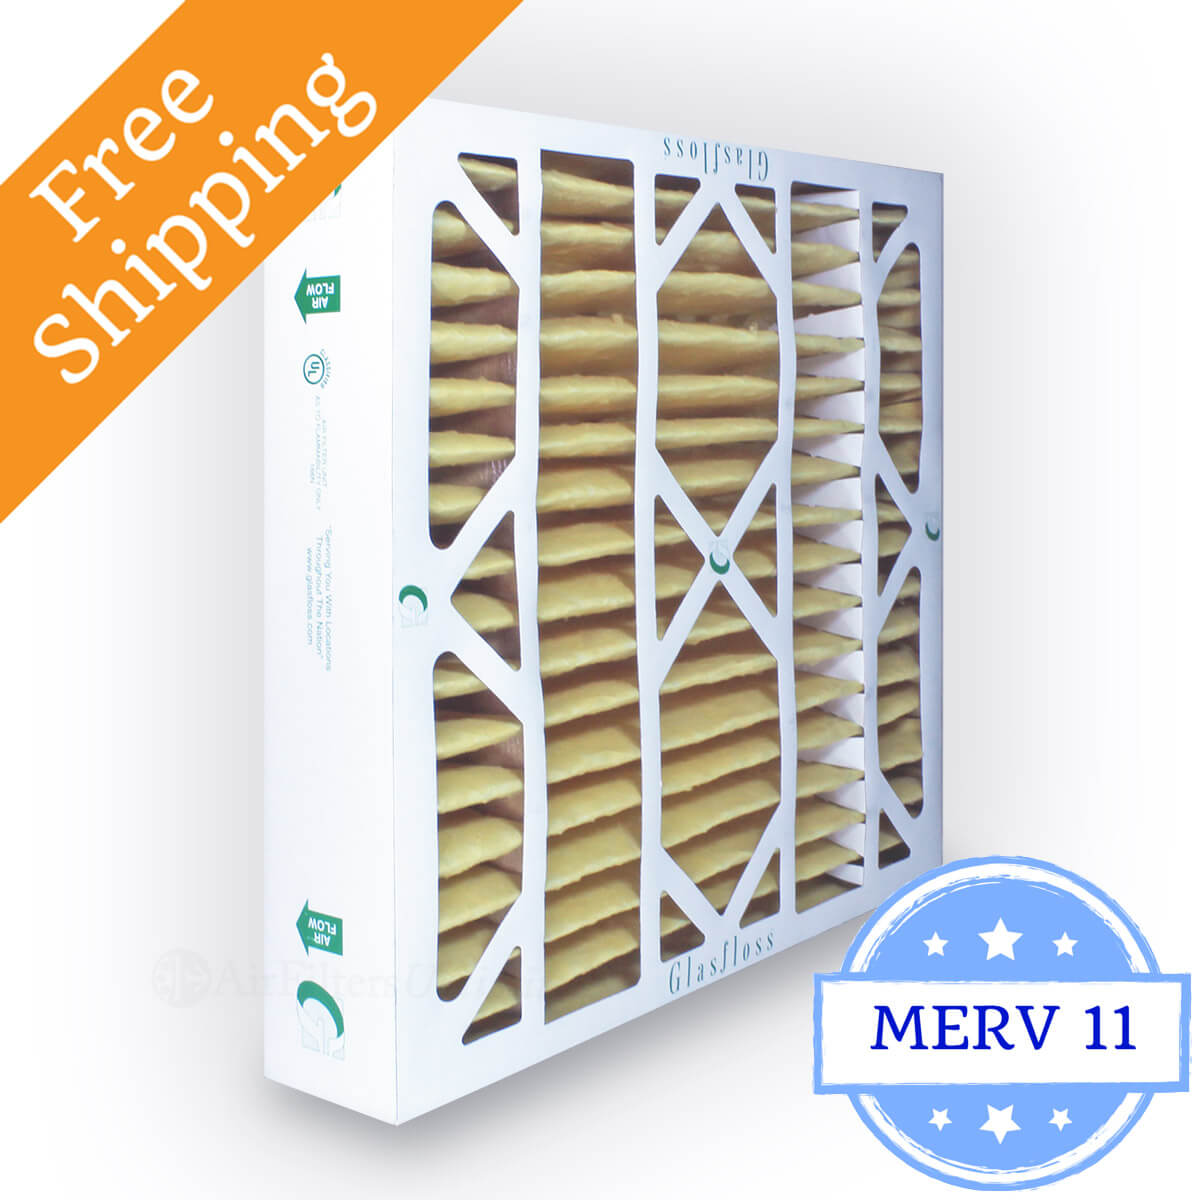 Glasfloss 20x20x4 Air Filter MR-11 Series